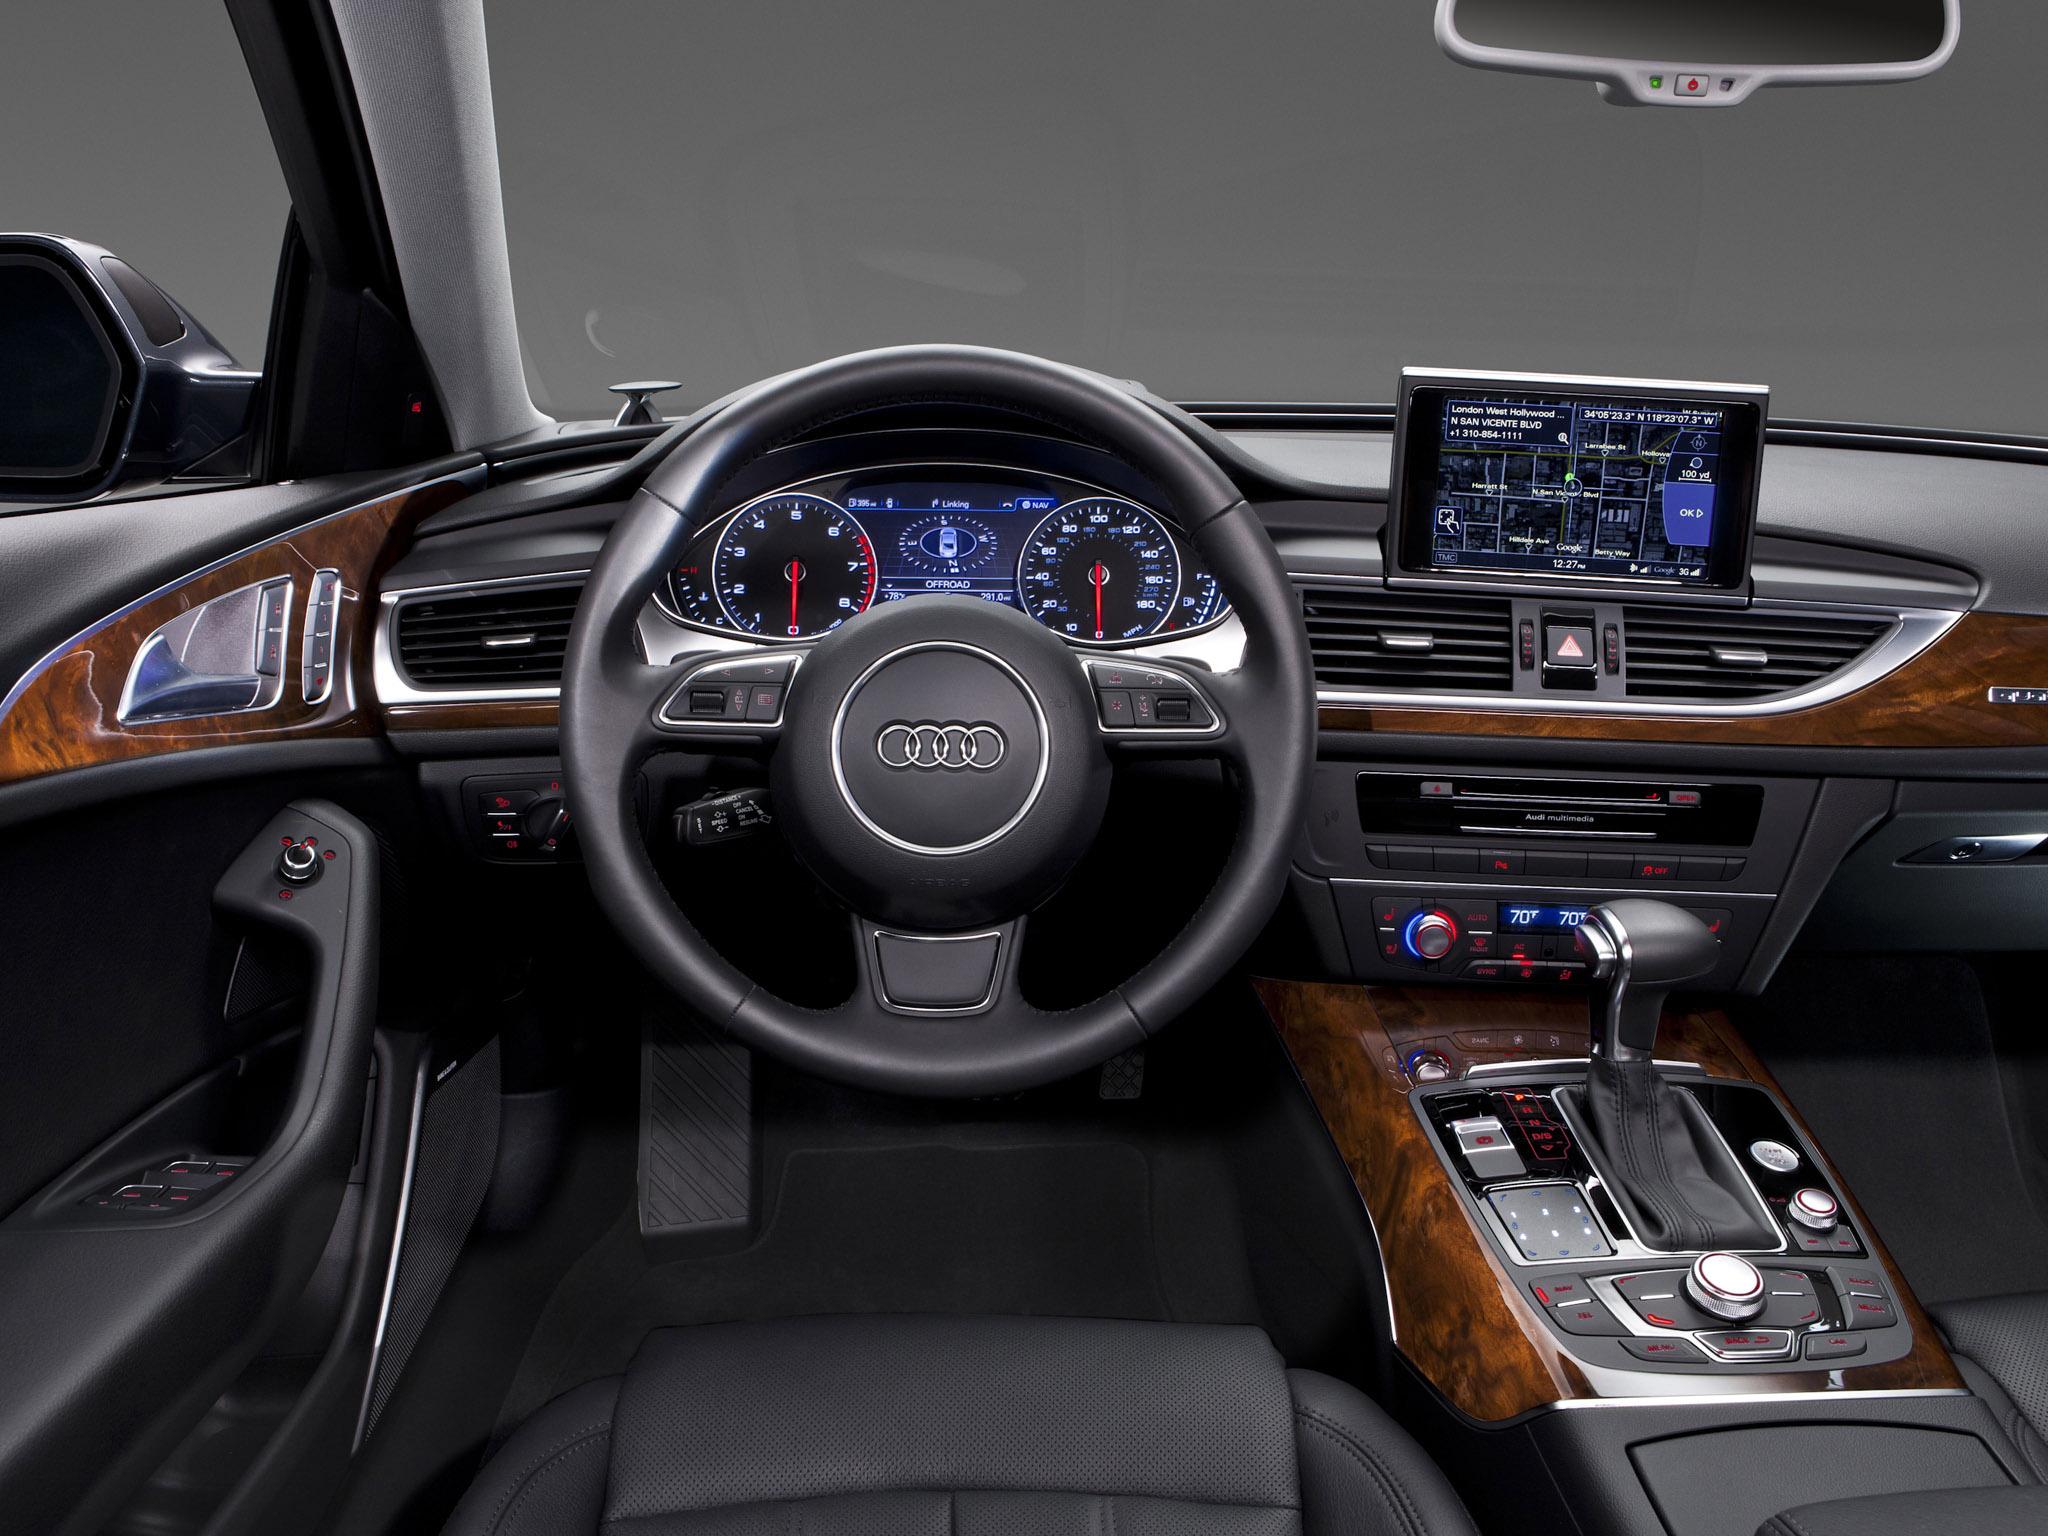 Audi A6 3 0t S Line Sedan Usa 2011 Audi A6 3 0t S Line